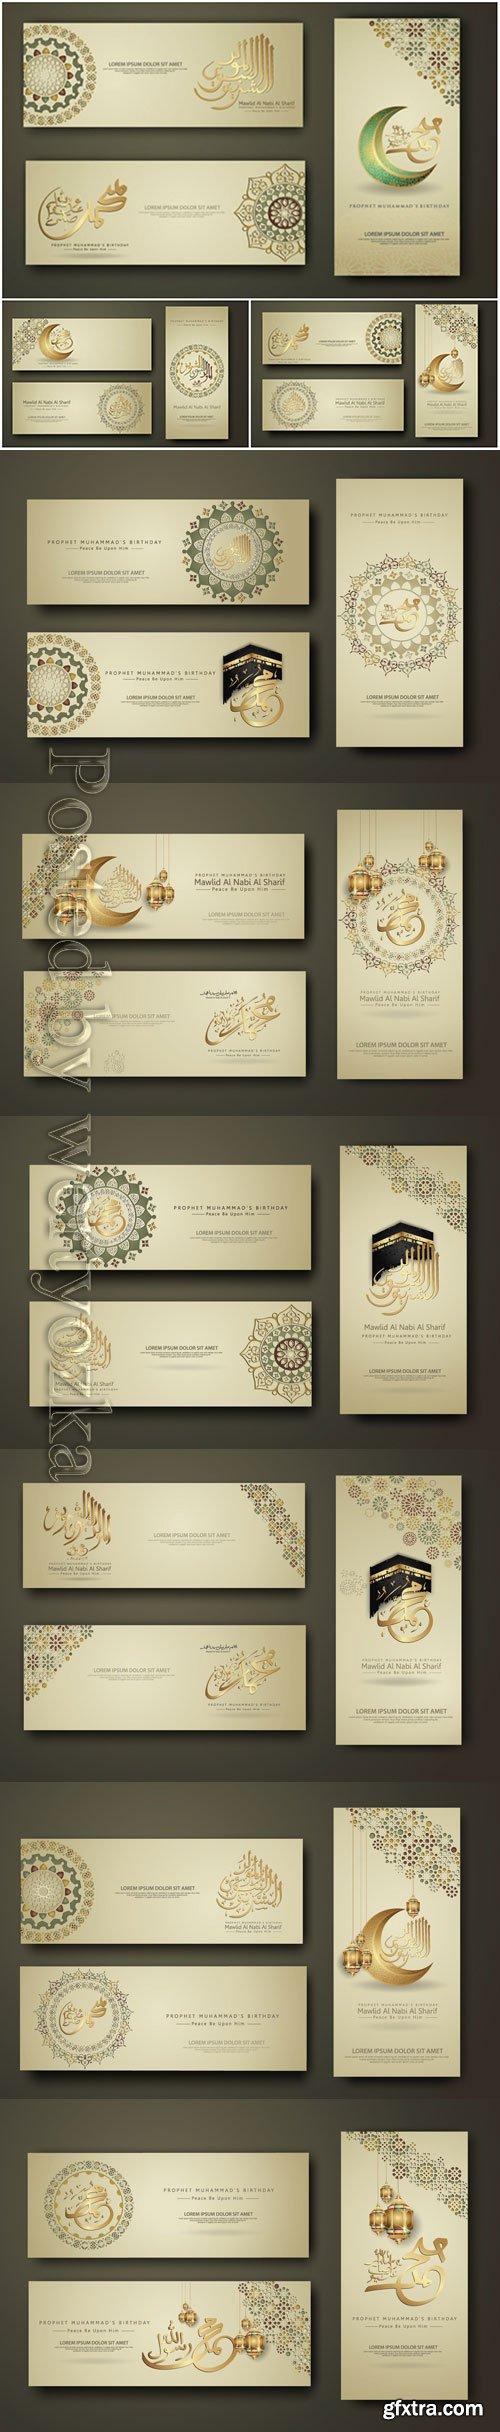 Set banner template with golden luxurious crescent moon